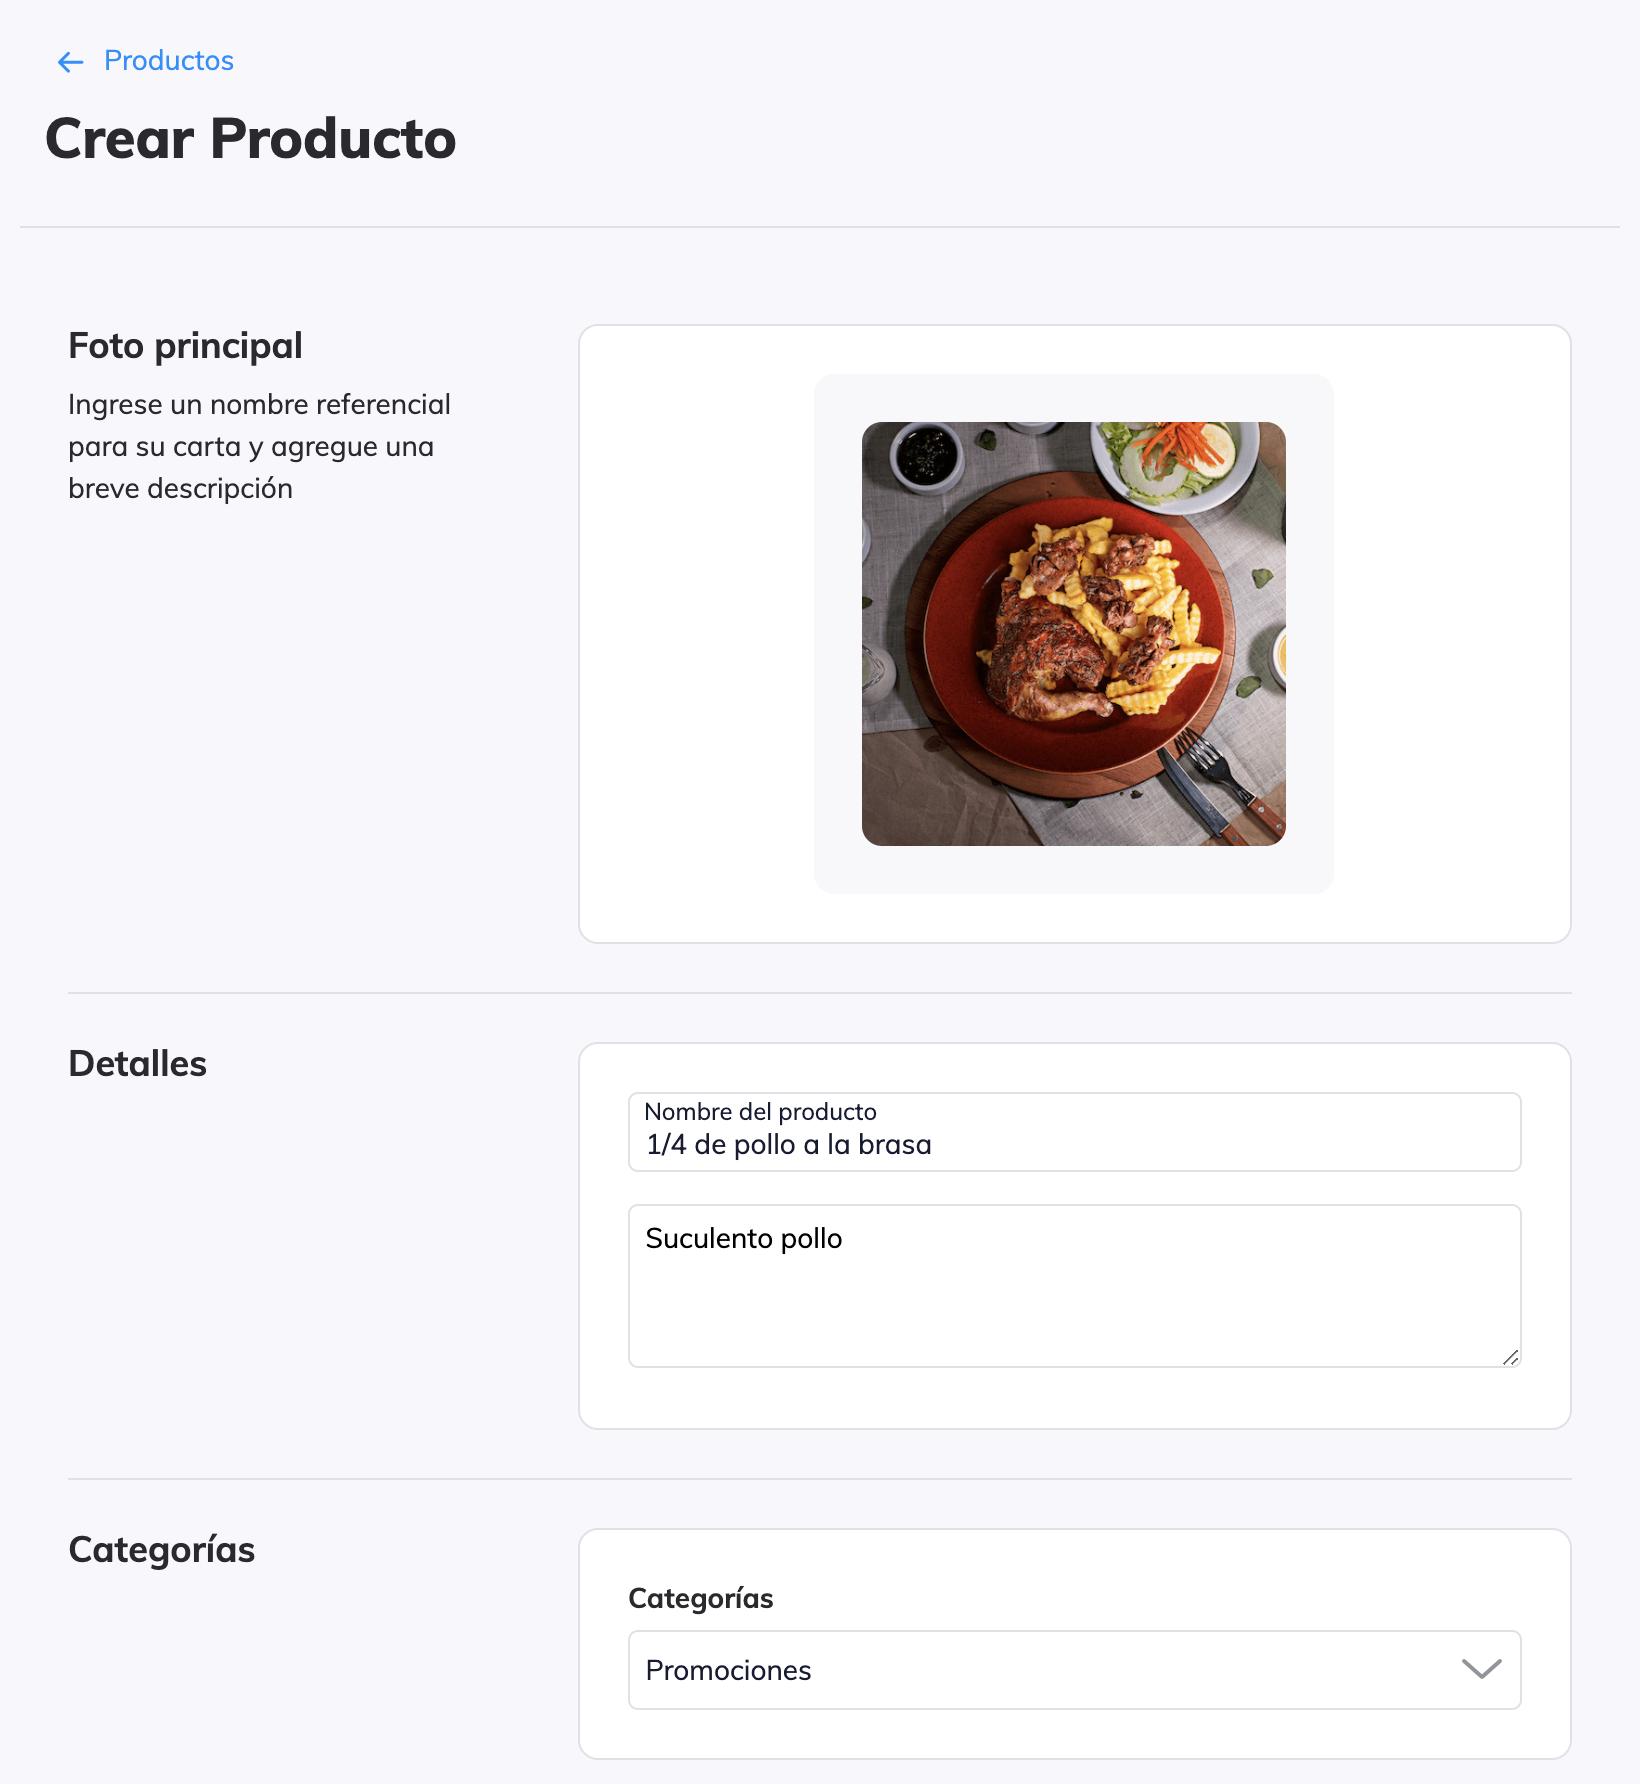 Creación de un producto